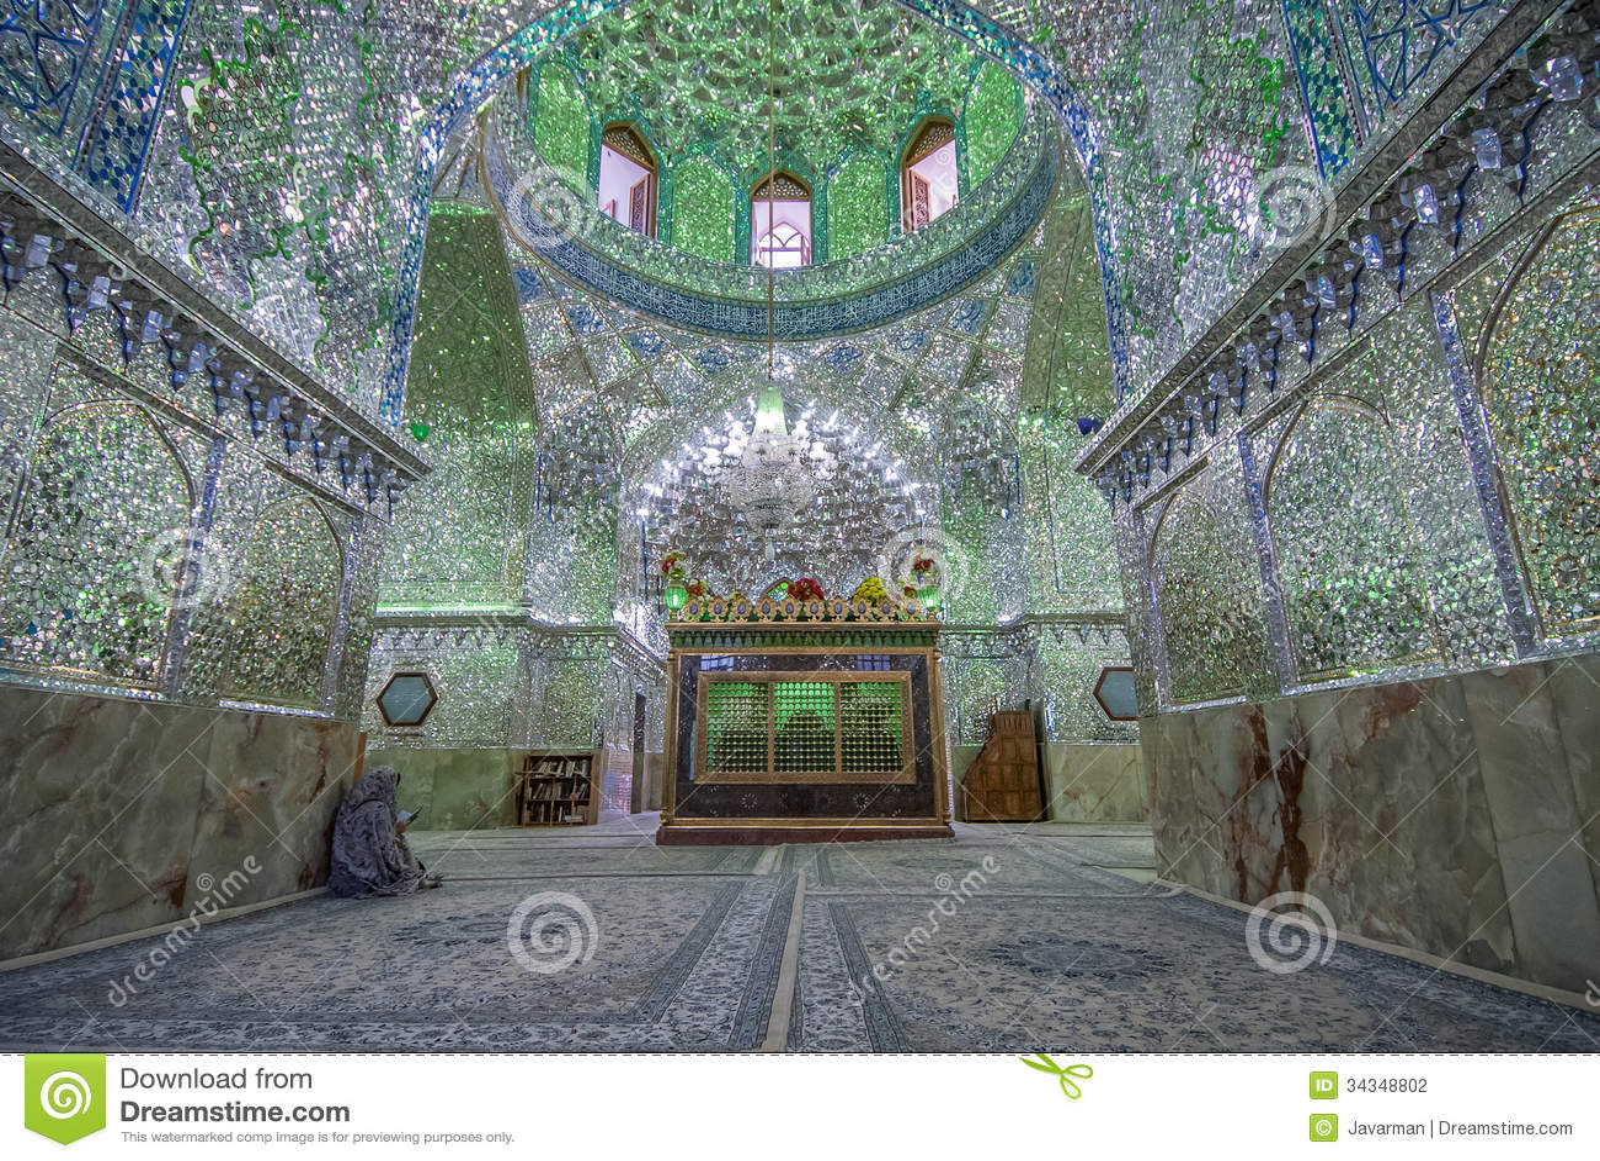 Stock Photography: Mirrored interior of Ali Ibn Hamza shrine in Shiraz ...